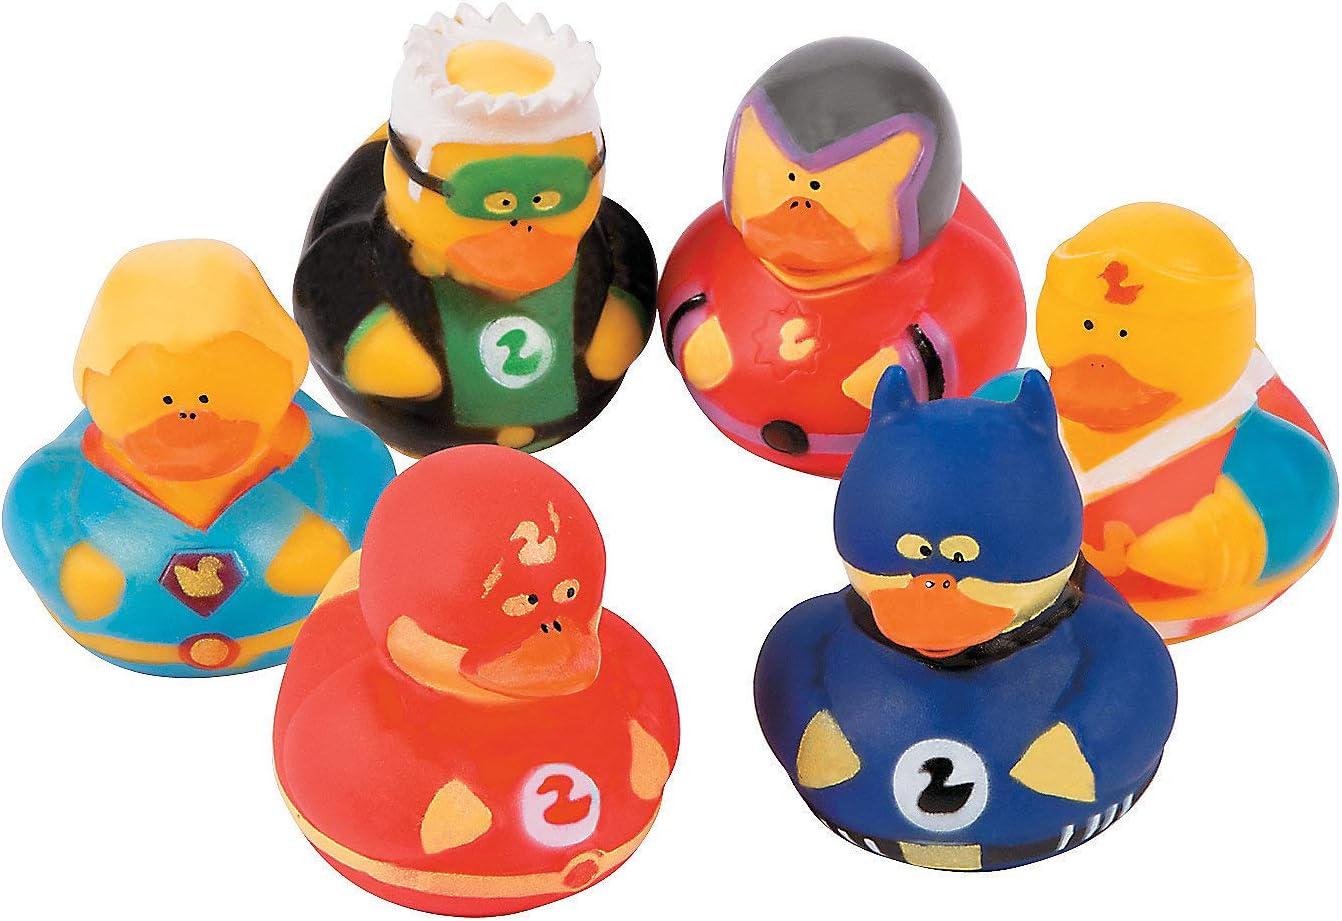 Fun Express Superhero Rubber Duckies (1 dz) Superhero Themed Party Favors, Character Toys, Rubber Duckies